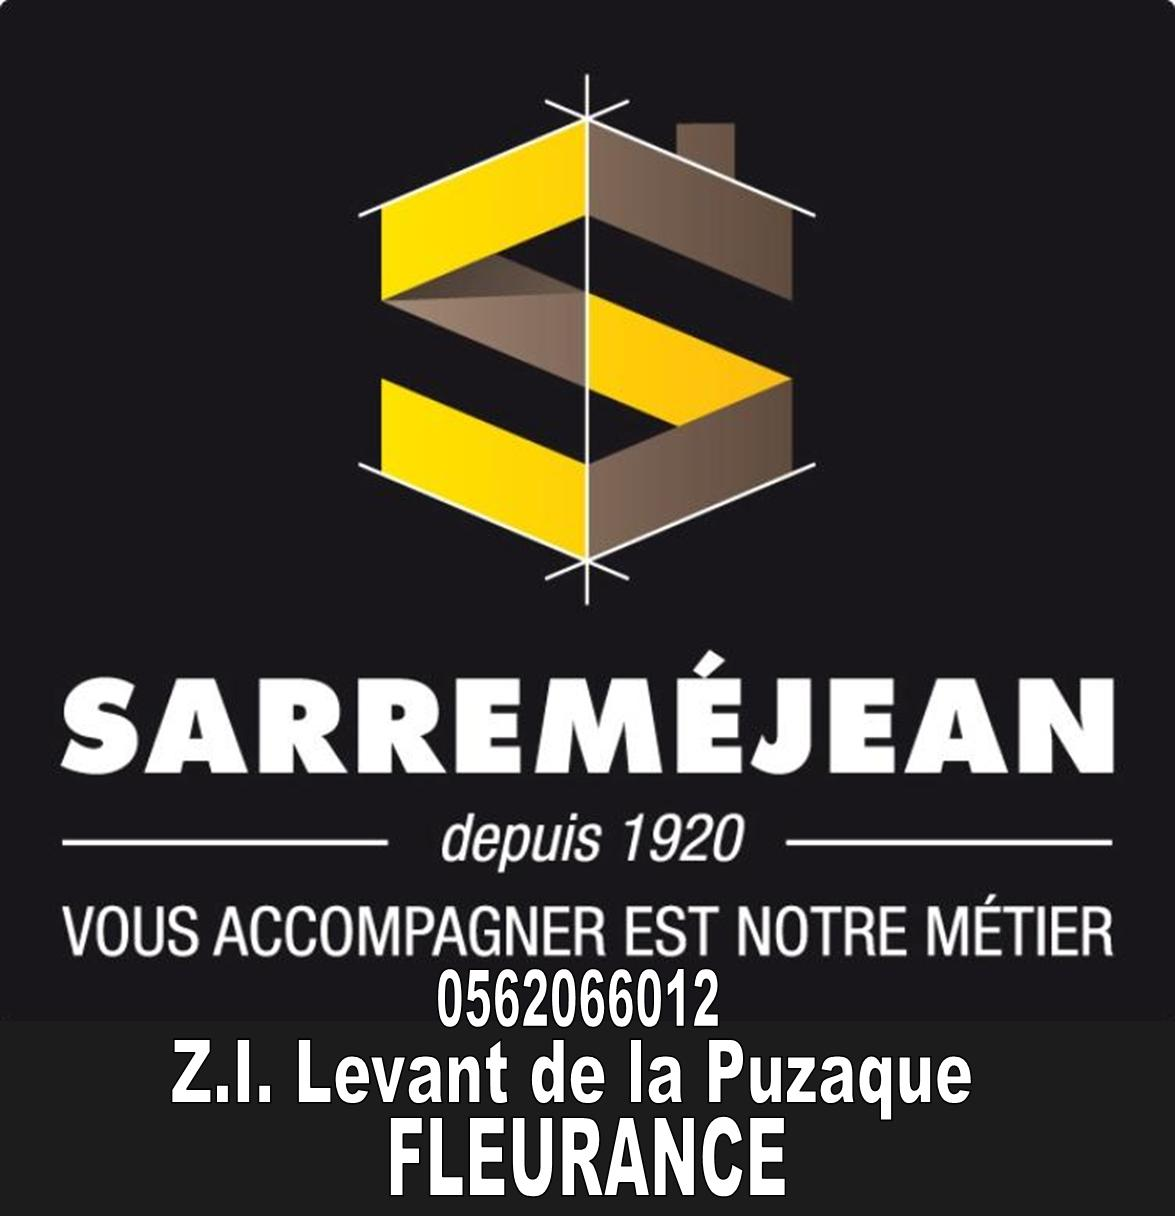 Sarreméjean